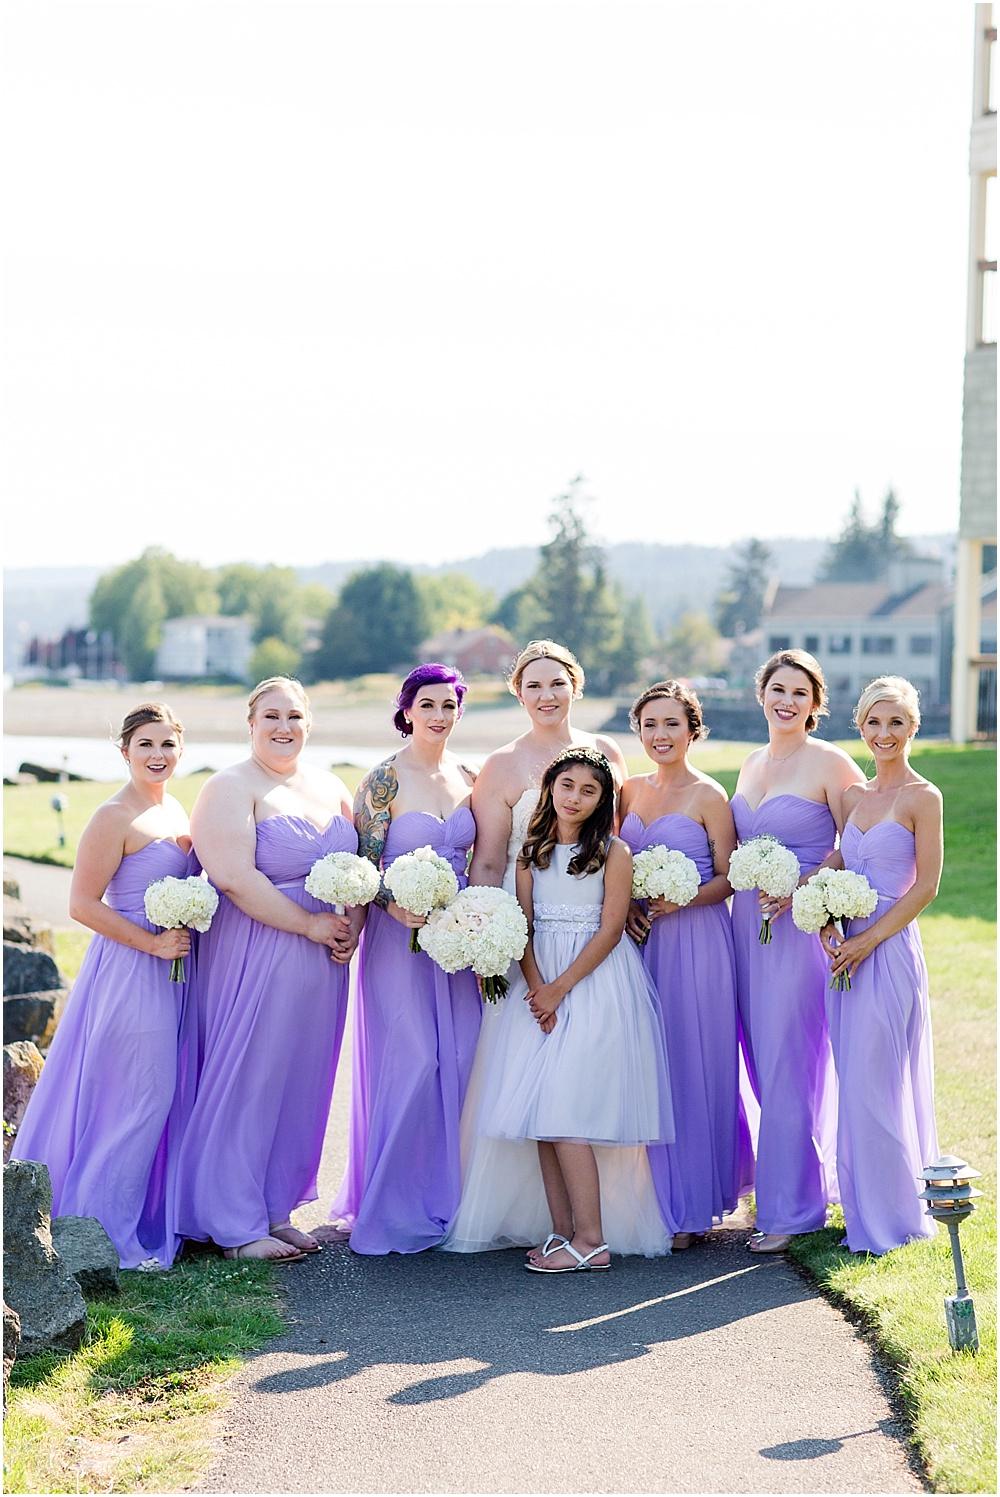 mitzner_silverdale_beach_hotel_wedding_silverdale_washington_pacific_northwest_wedding_photographer_0031